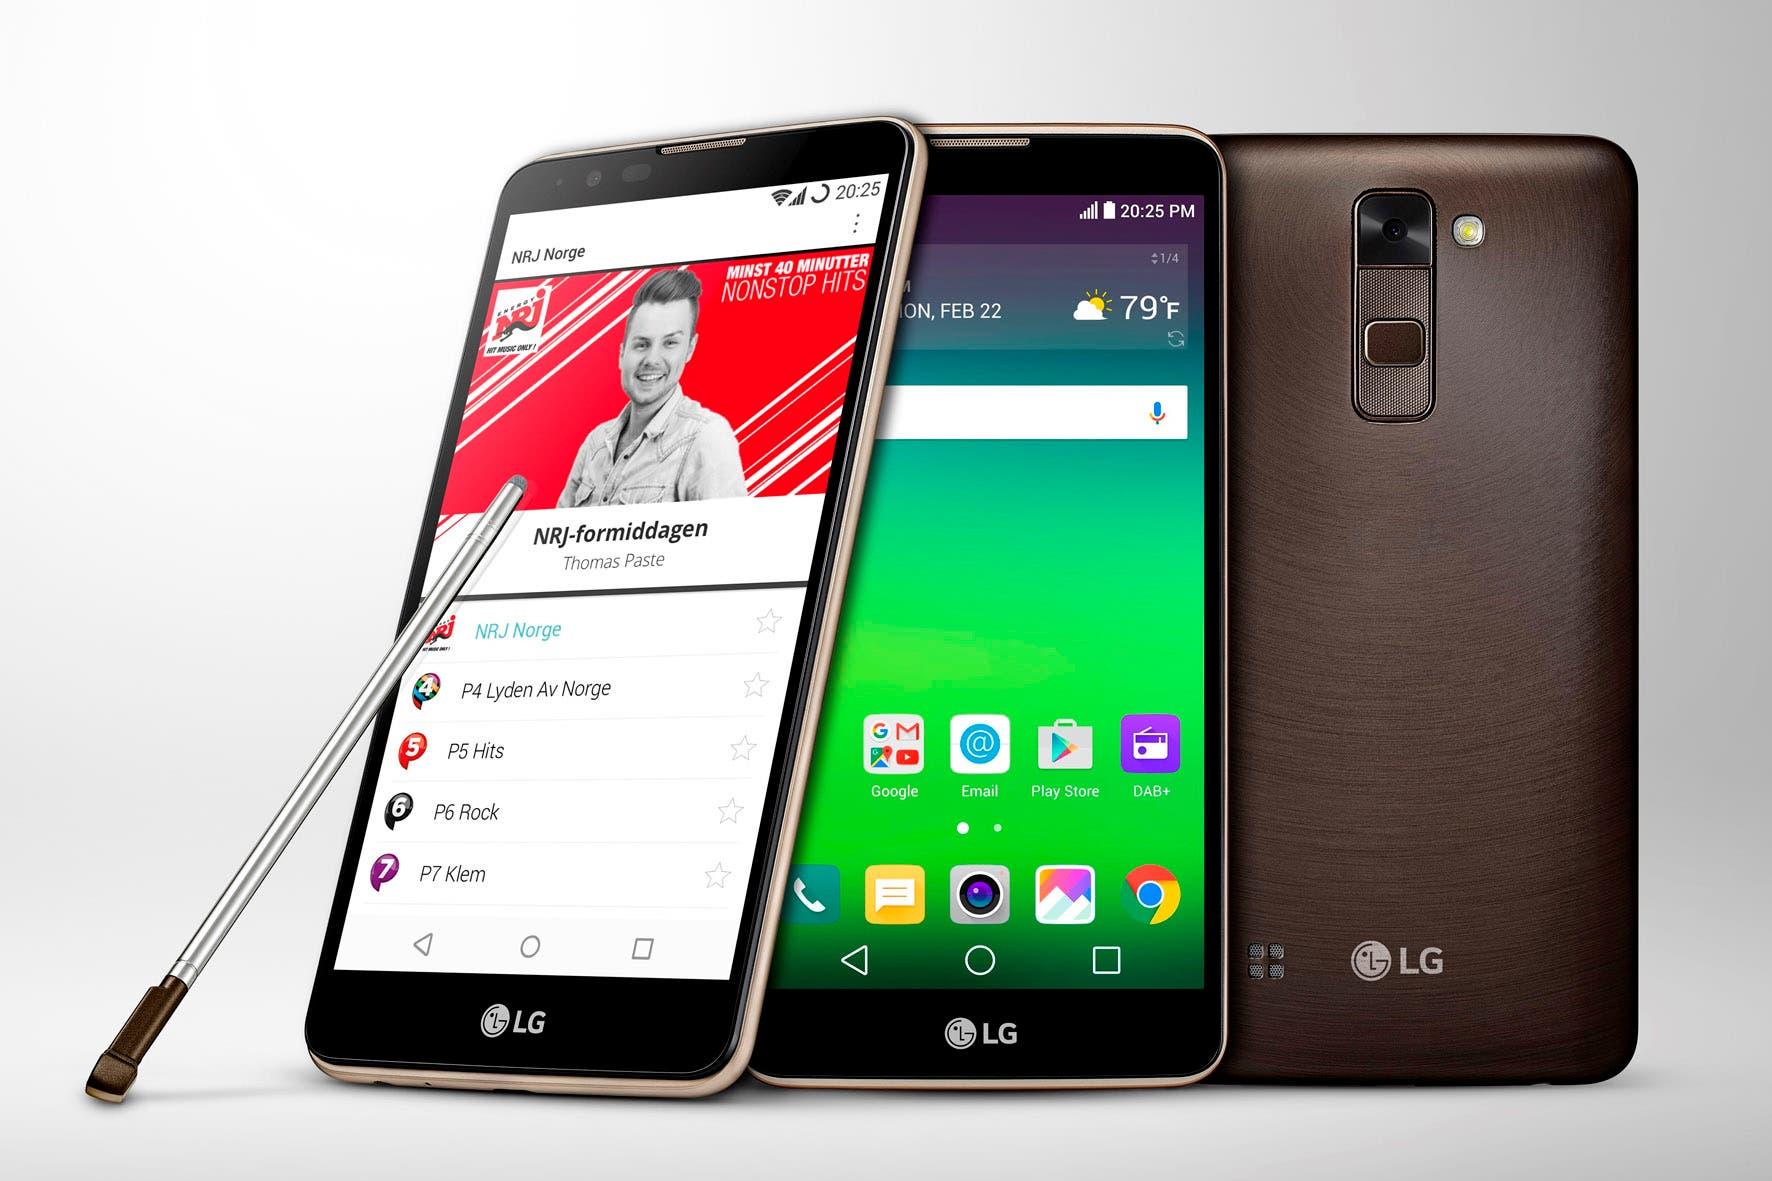 LG Stylus 2 DAB+